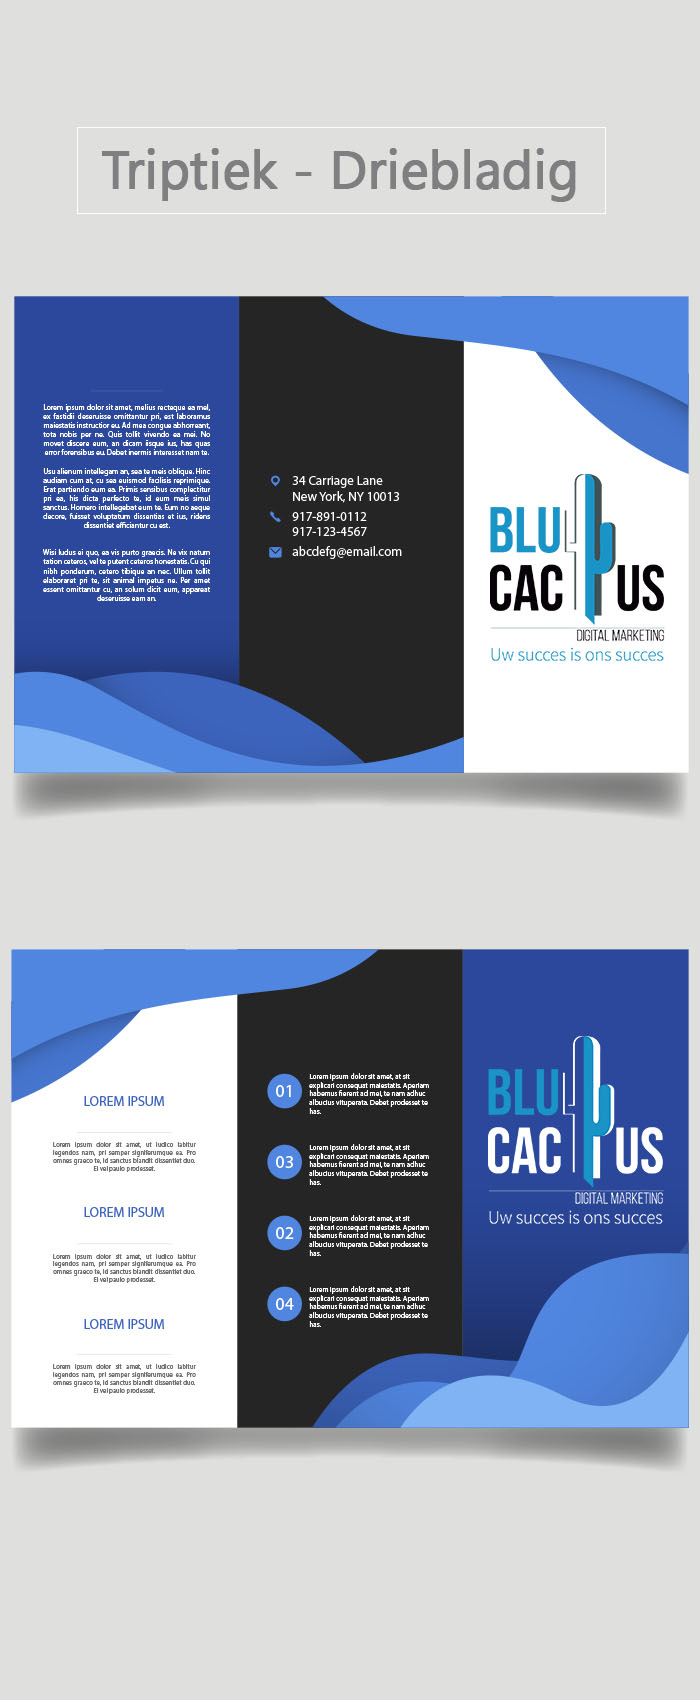 BluCactus - Brochure Ontwerp Bureau - Drieluik